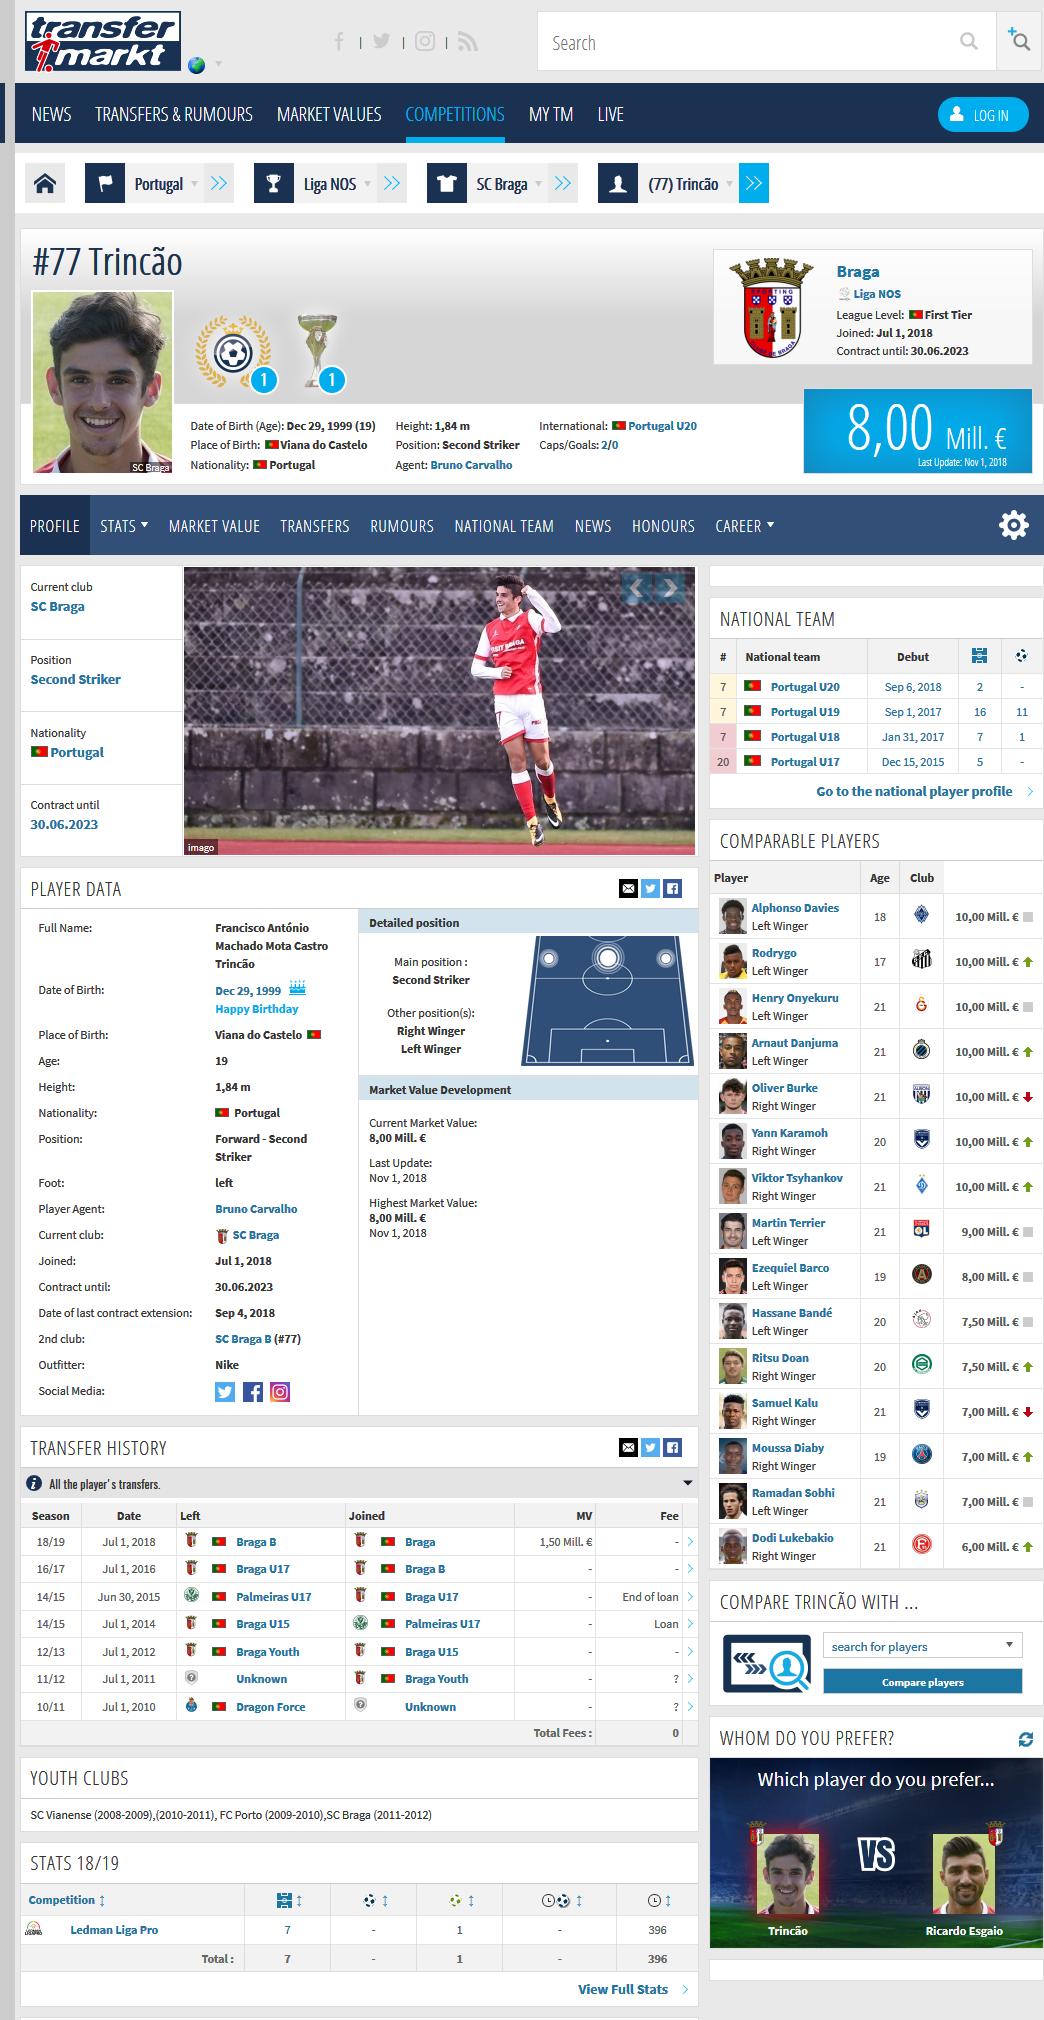 Screenshot-2018-12-28-Trinc-o-Player-Profile-18-19.png